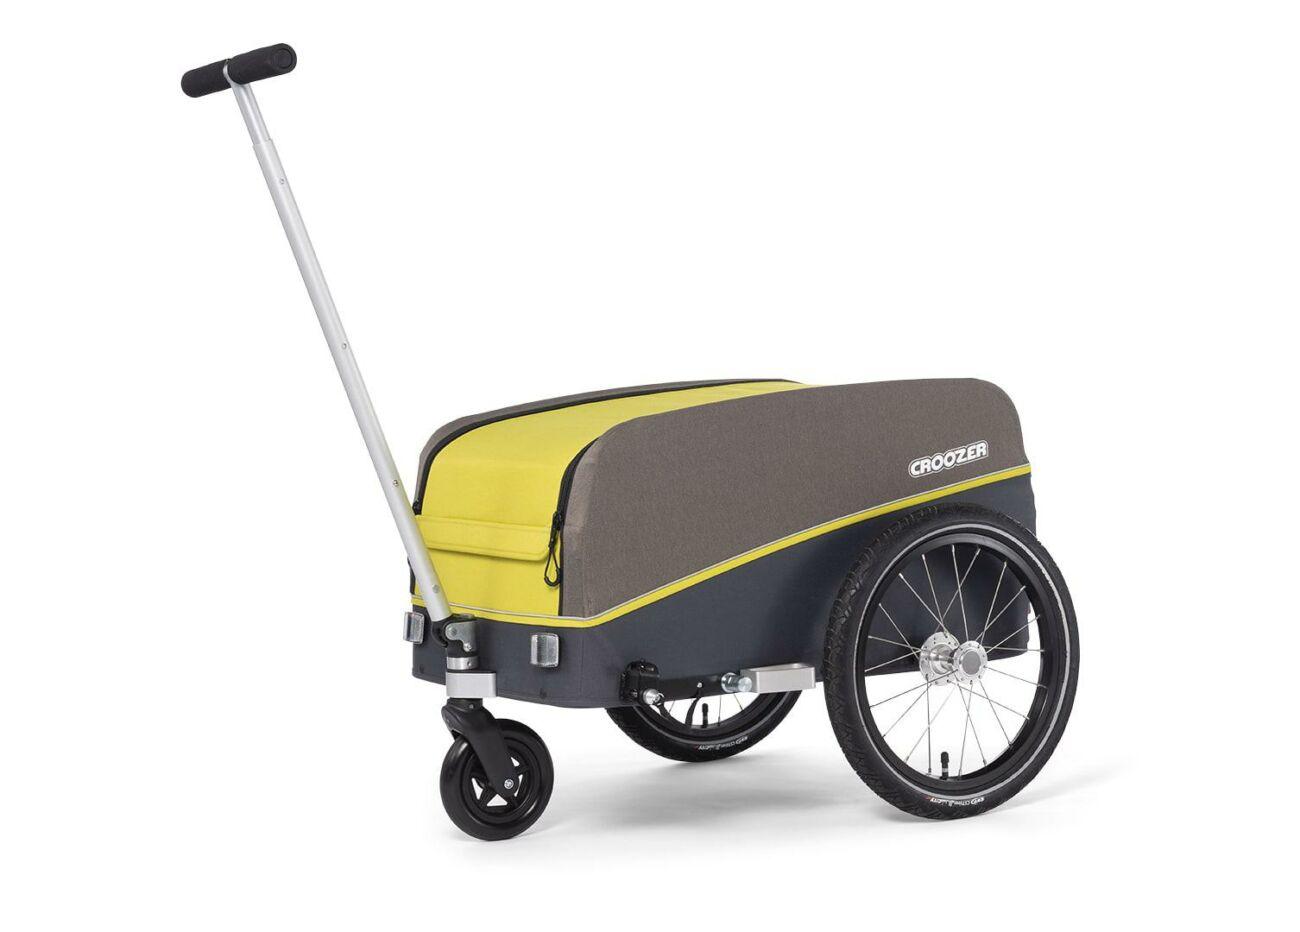 121008120 Croozer Cargo Kalle Bollerwagen 01 Lemon Green 2020 Web